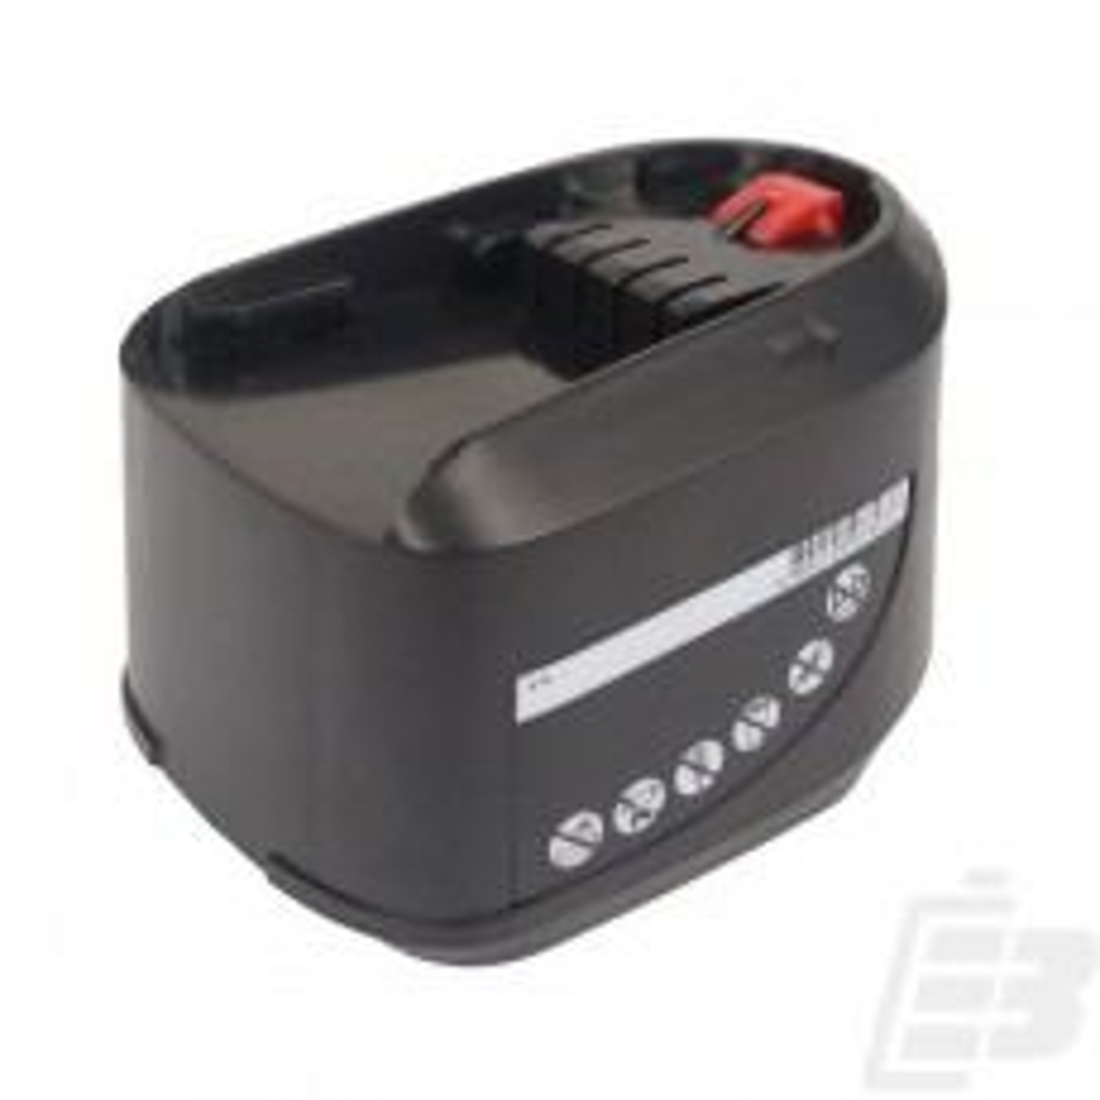 Power tool battery Bosch 18V 3.0Ah LiIon_1